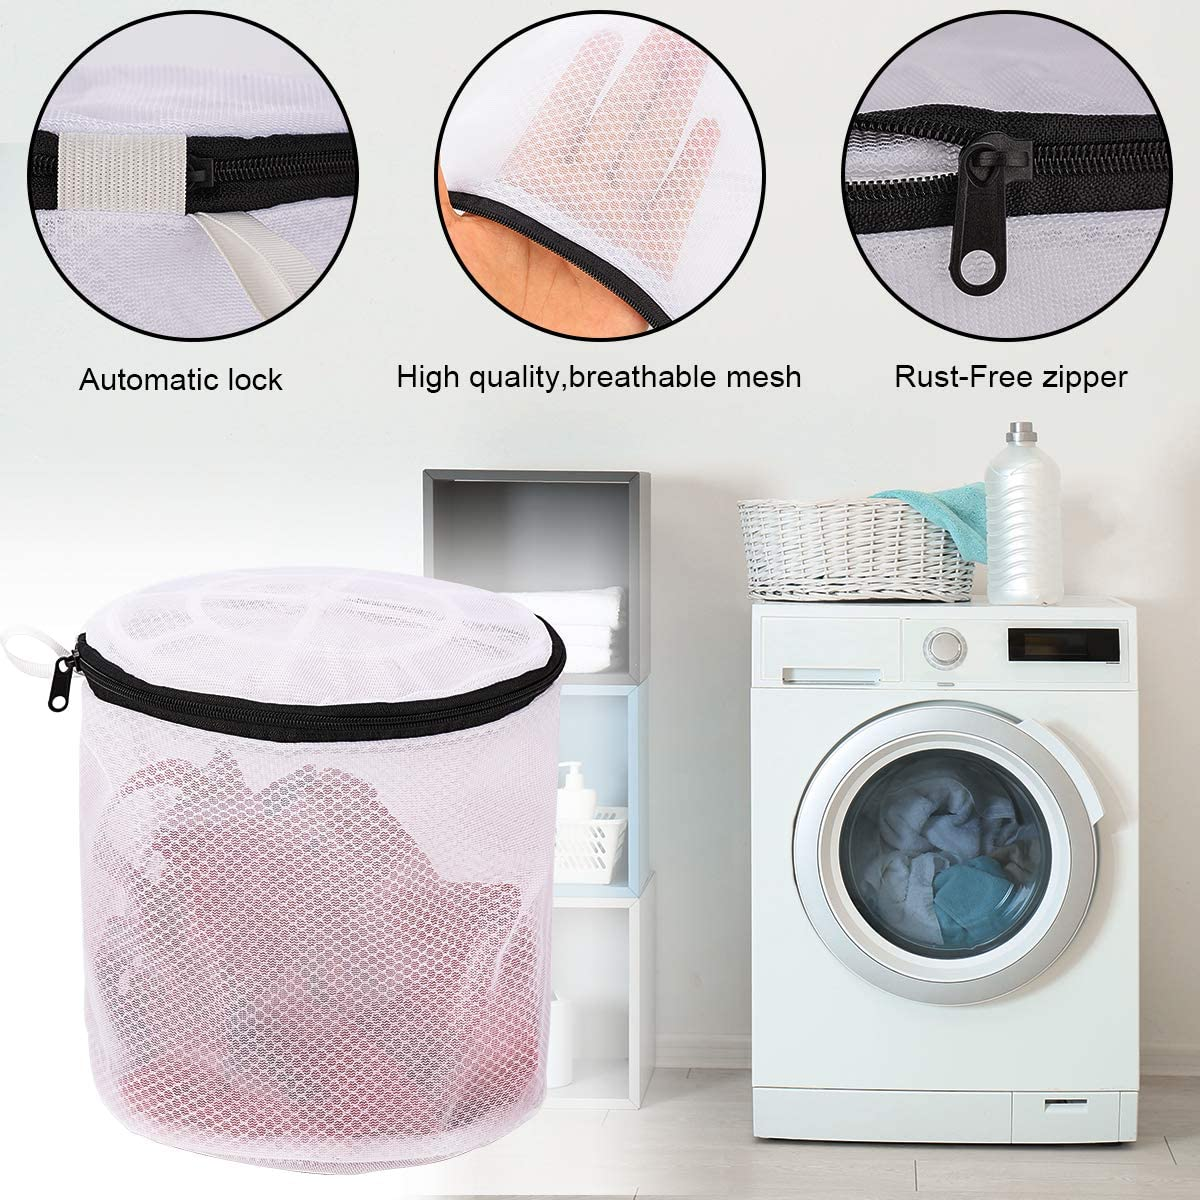 Bra Bag, 3 Set YLWEFT Bra Washing Bags for Laundry Bra Washer Protector Sock Bag for Washing Machine Underwear Washing Bag Mesh Laundry Bag Lingerie Bags for Laundry